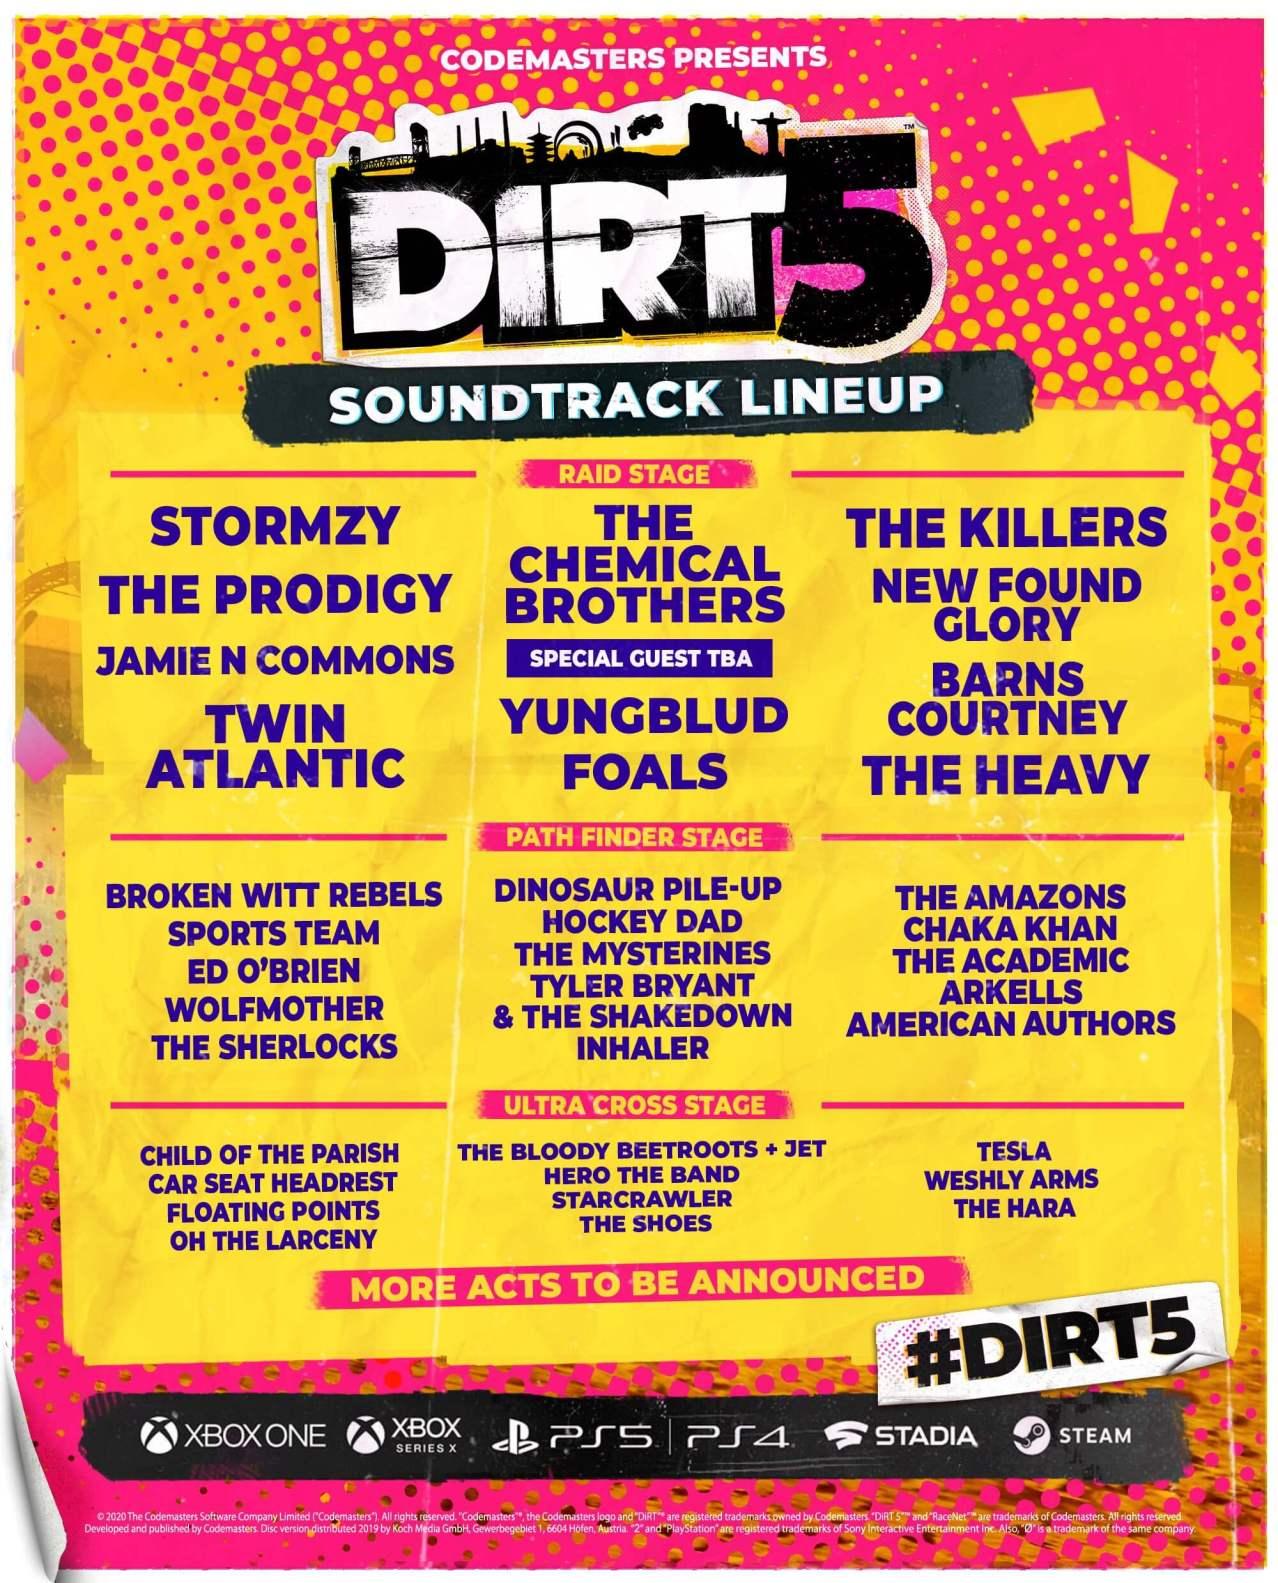 banda sonora de DiRT 5